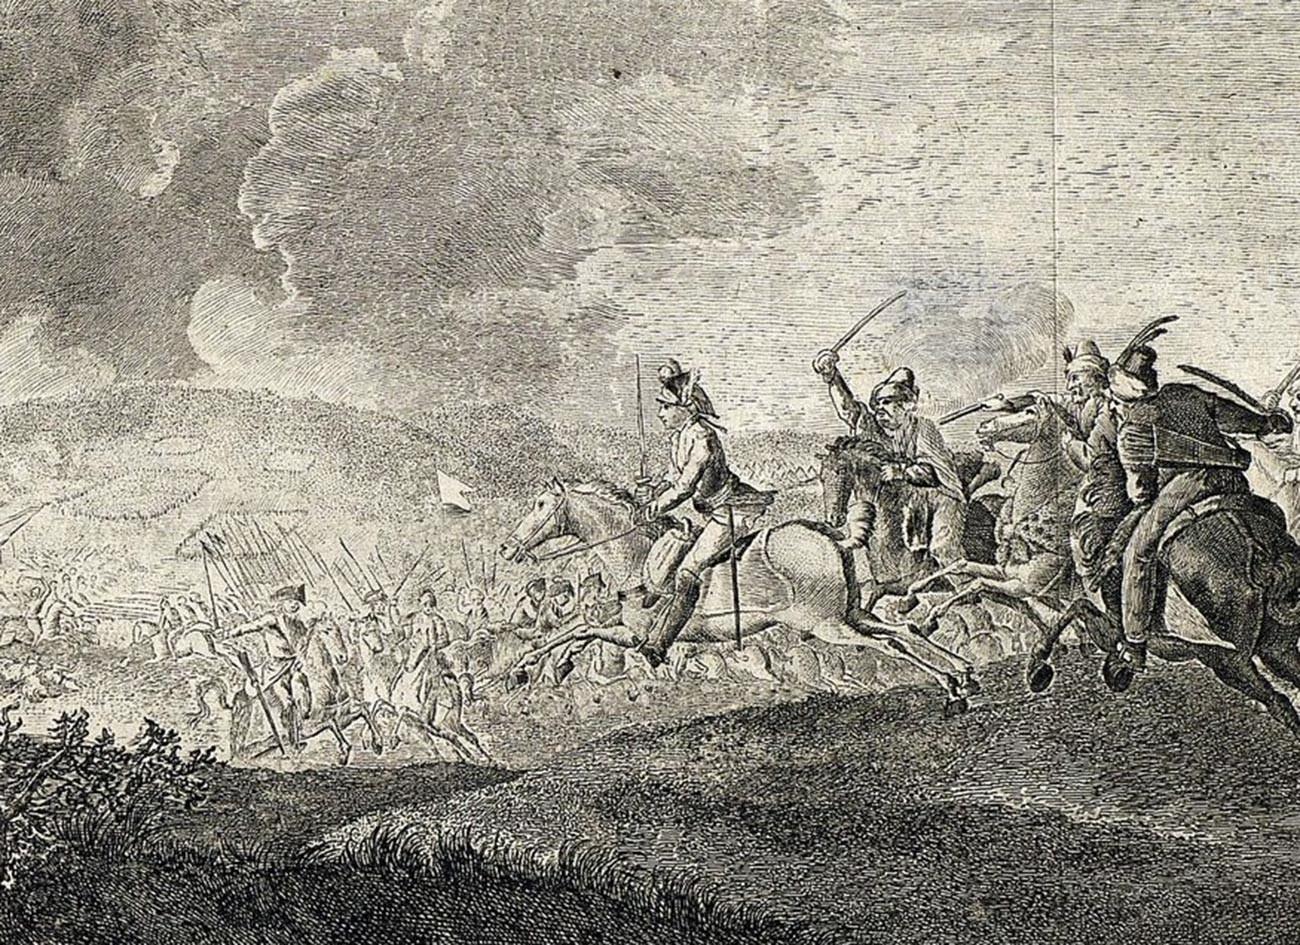 Bataille de Kozloudja